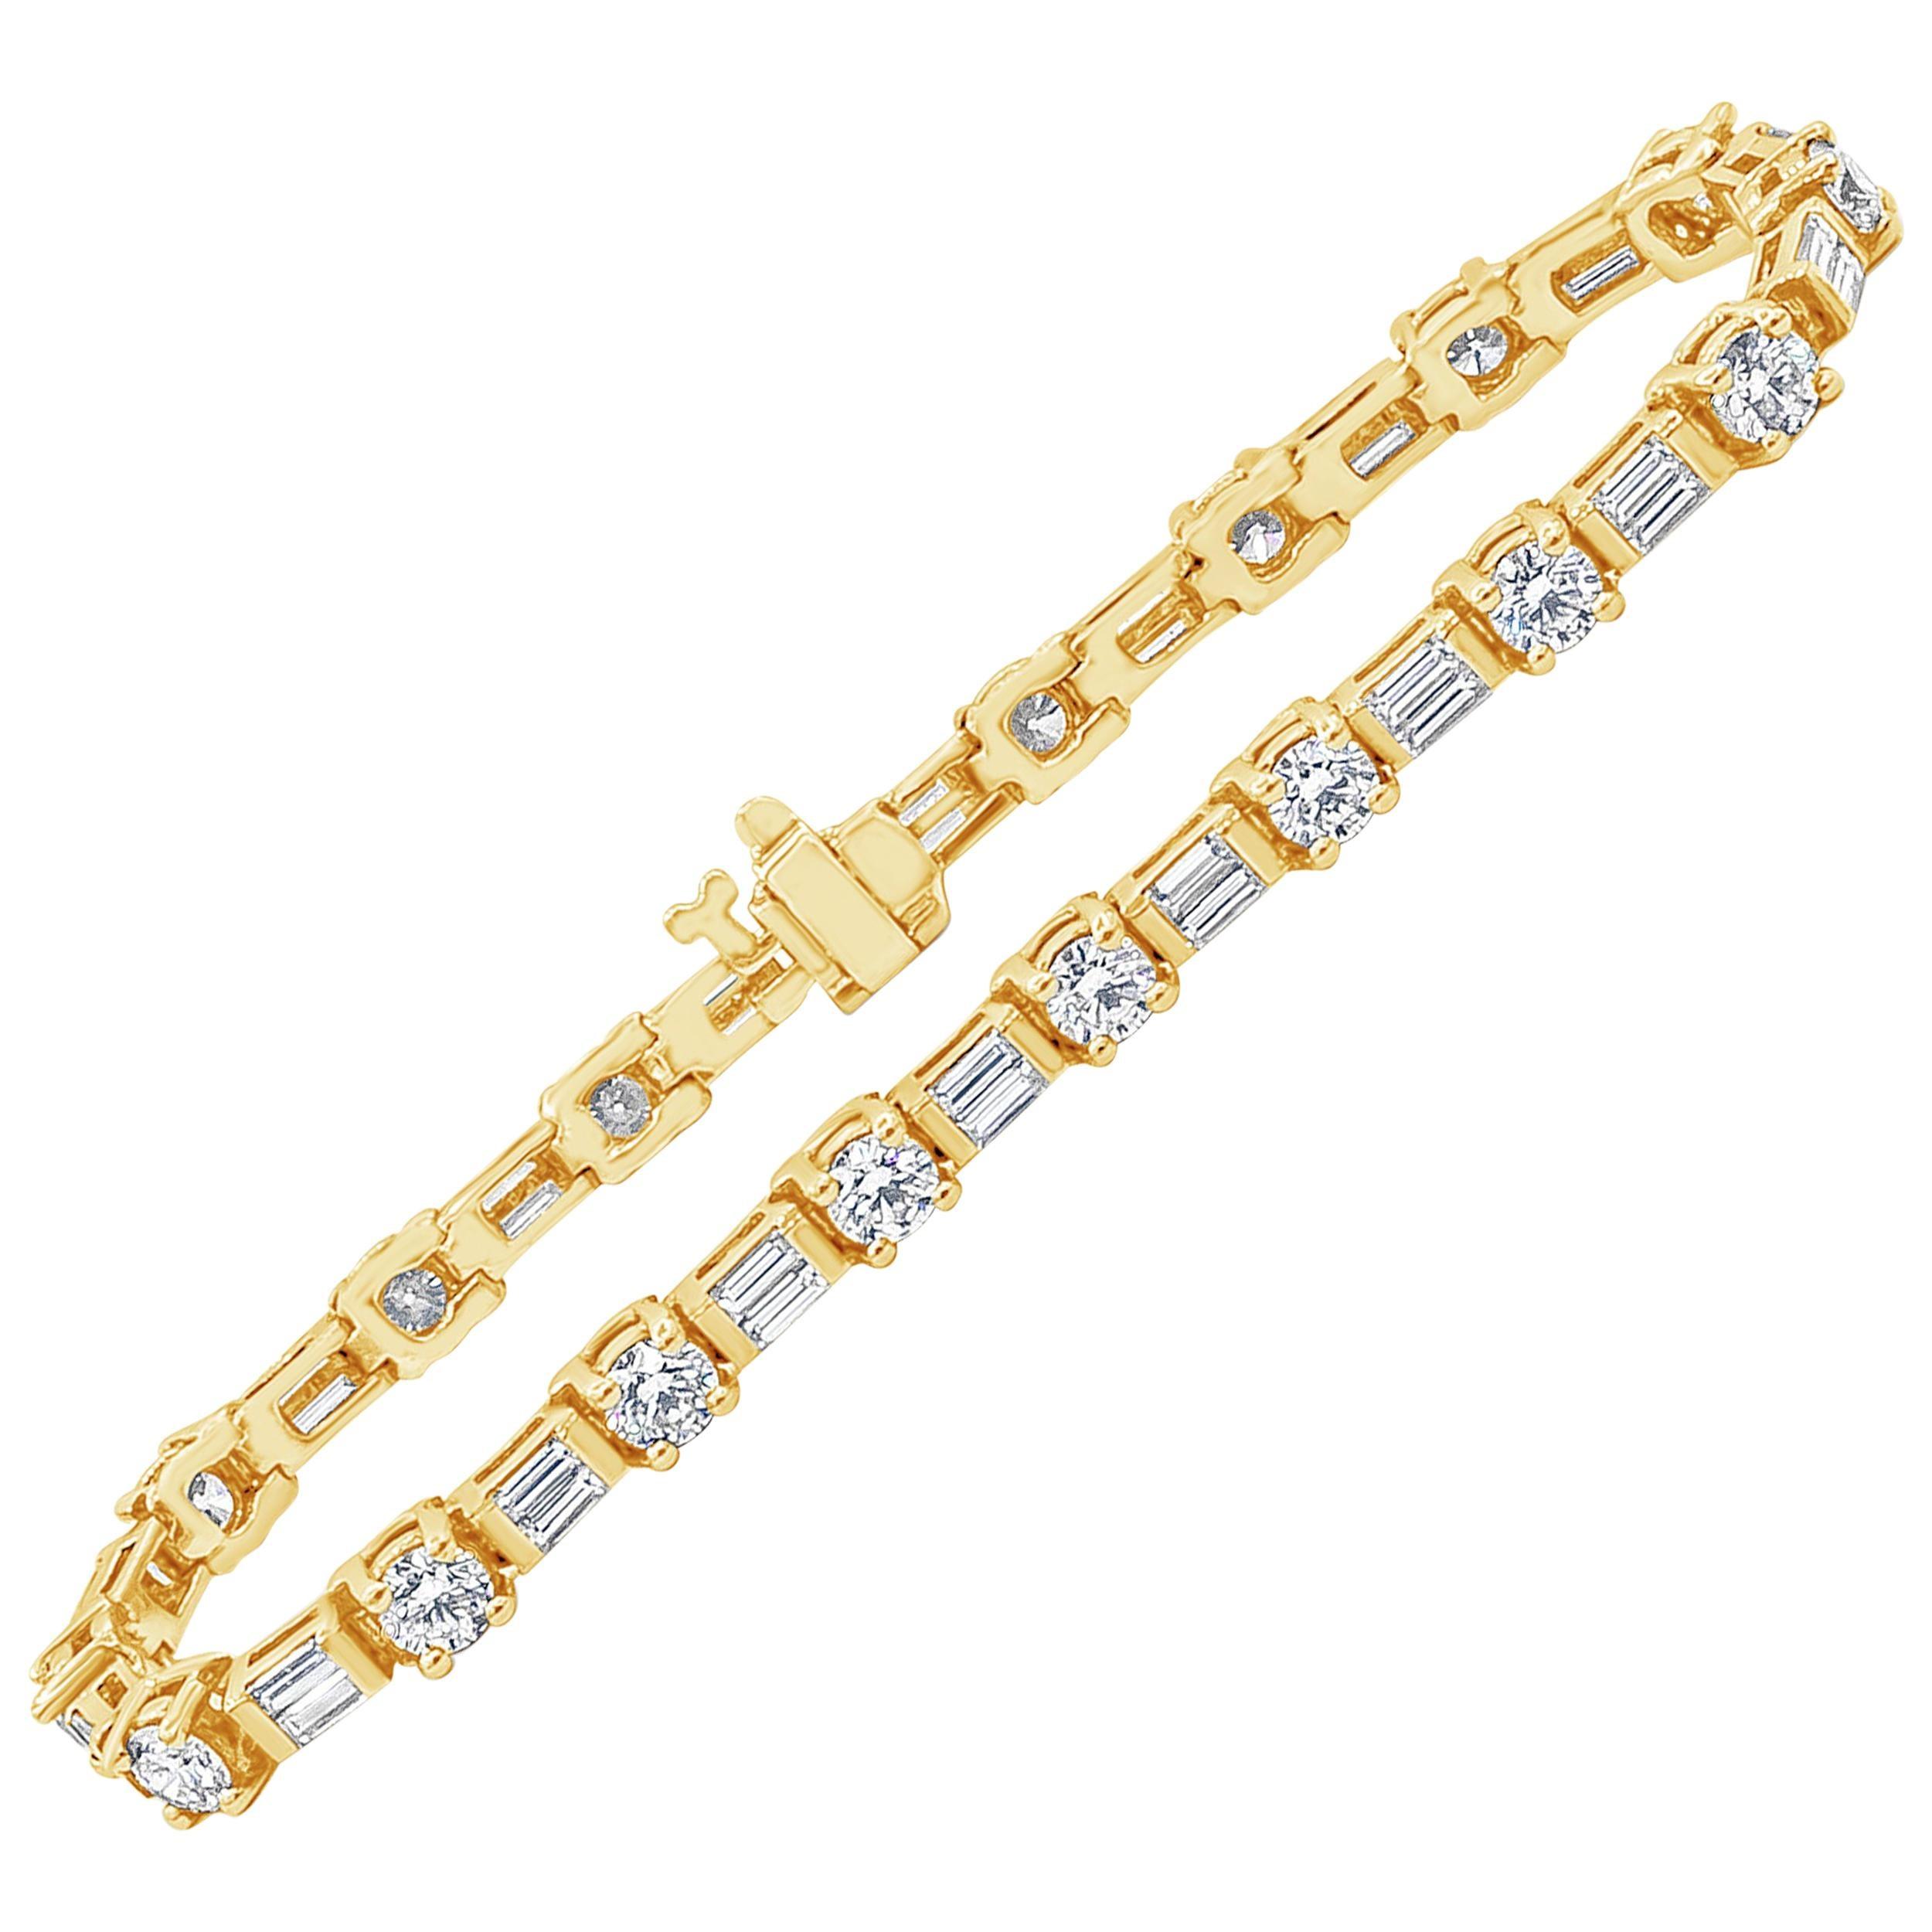 Alternating Round and Baguette Diamond Yellow Gold Tennis Bracelet